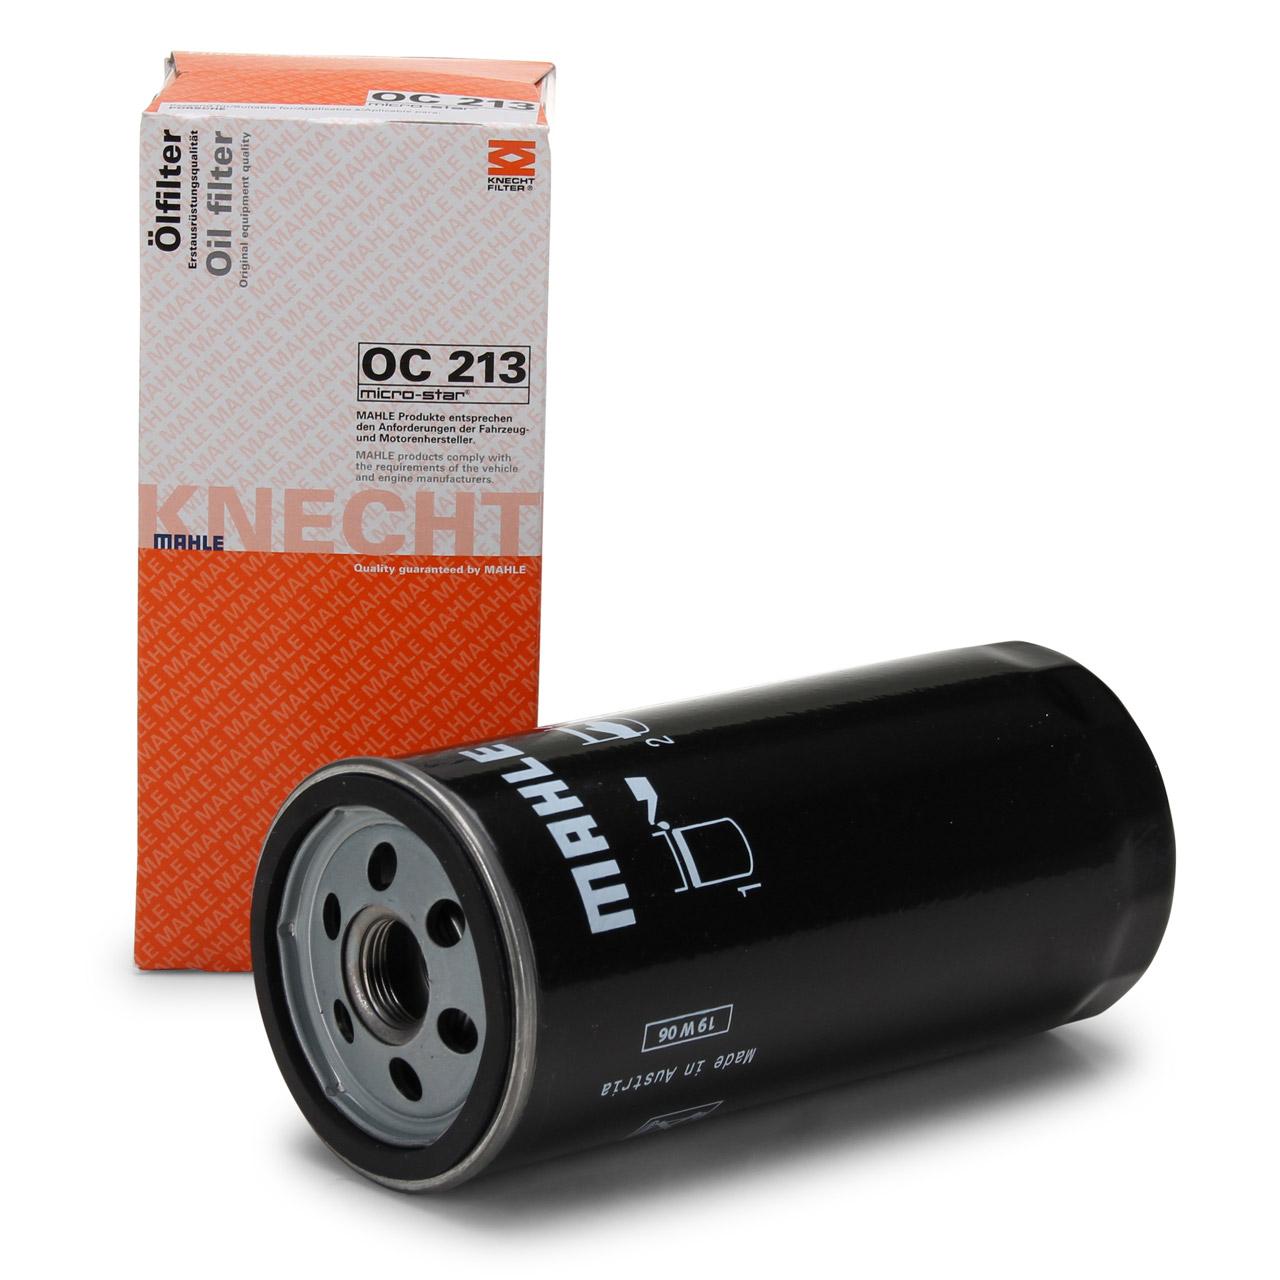 KNECHT / MAHLE OC213 Ölfilter PORSCHE 911 (993) 3.6/3.8 Carrera + 3.6 Turbo/GT2